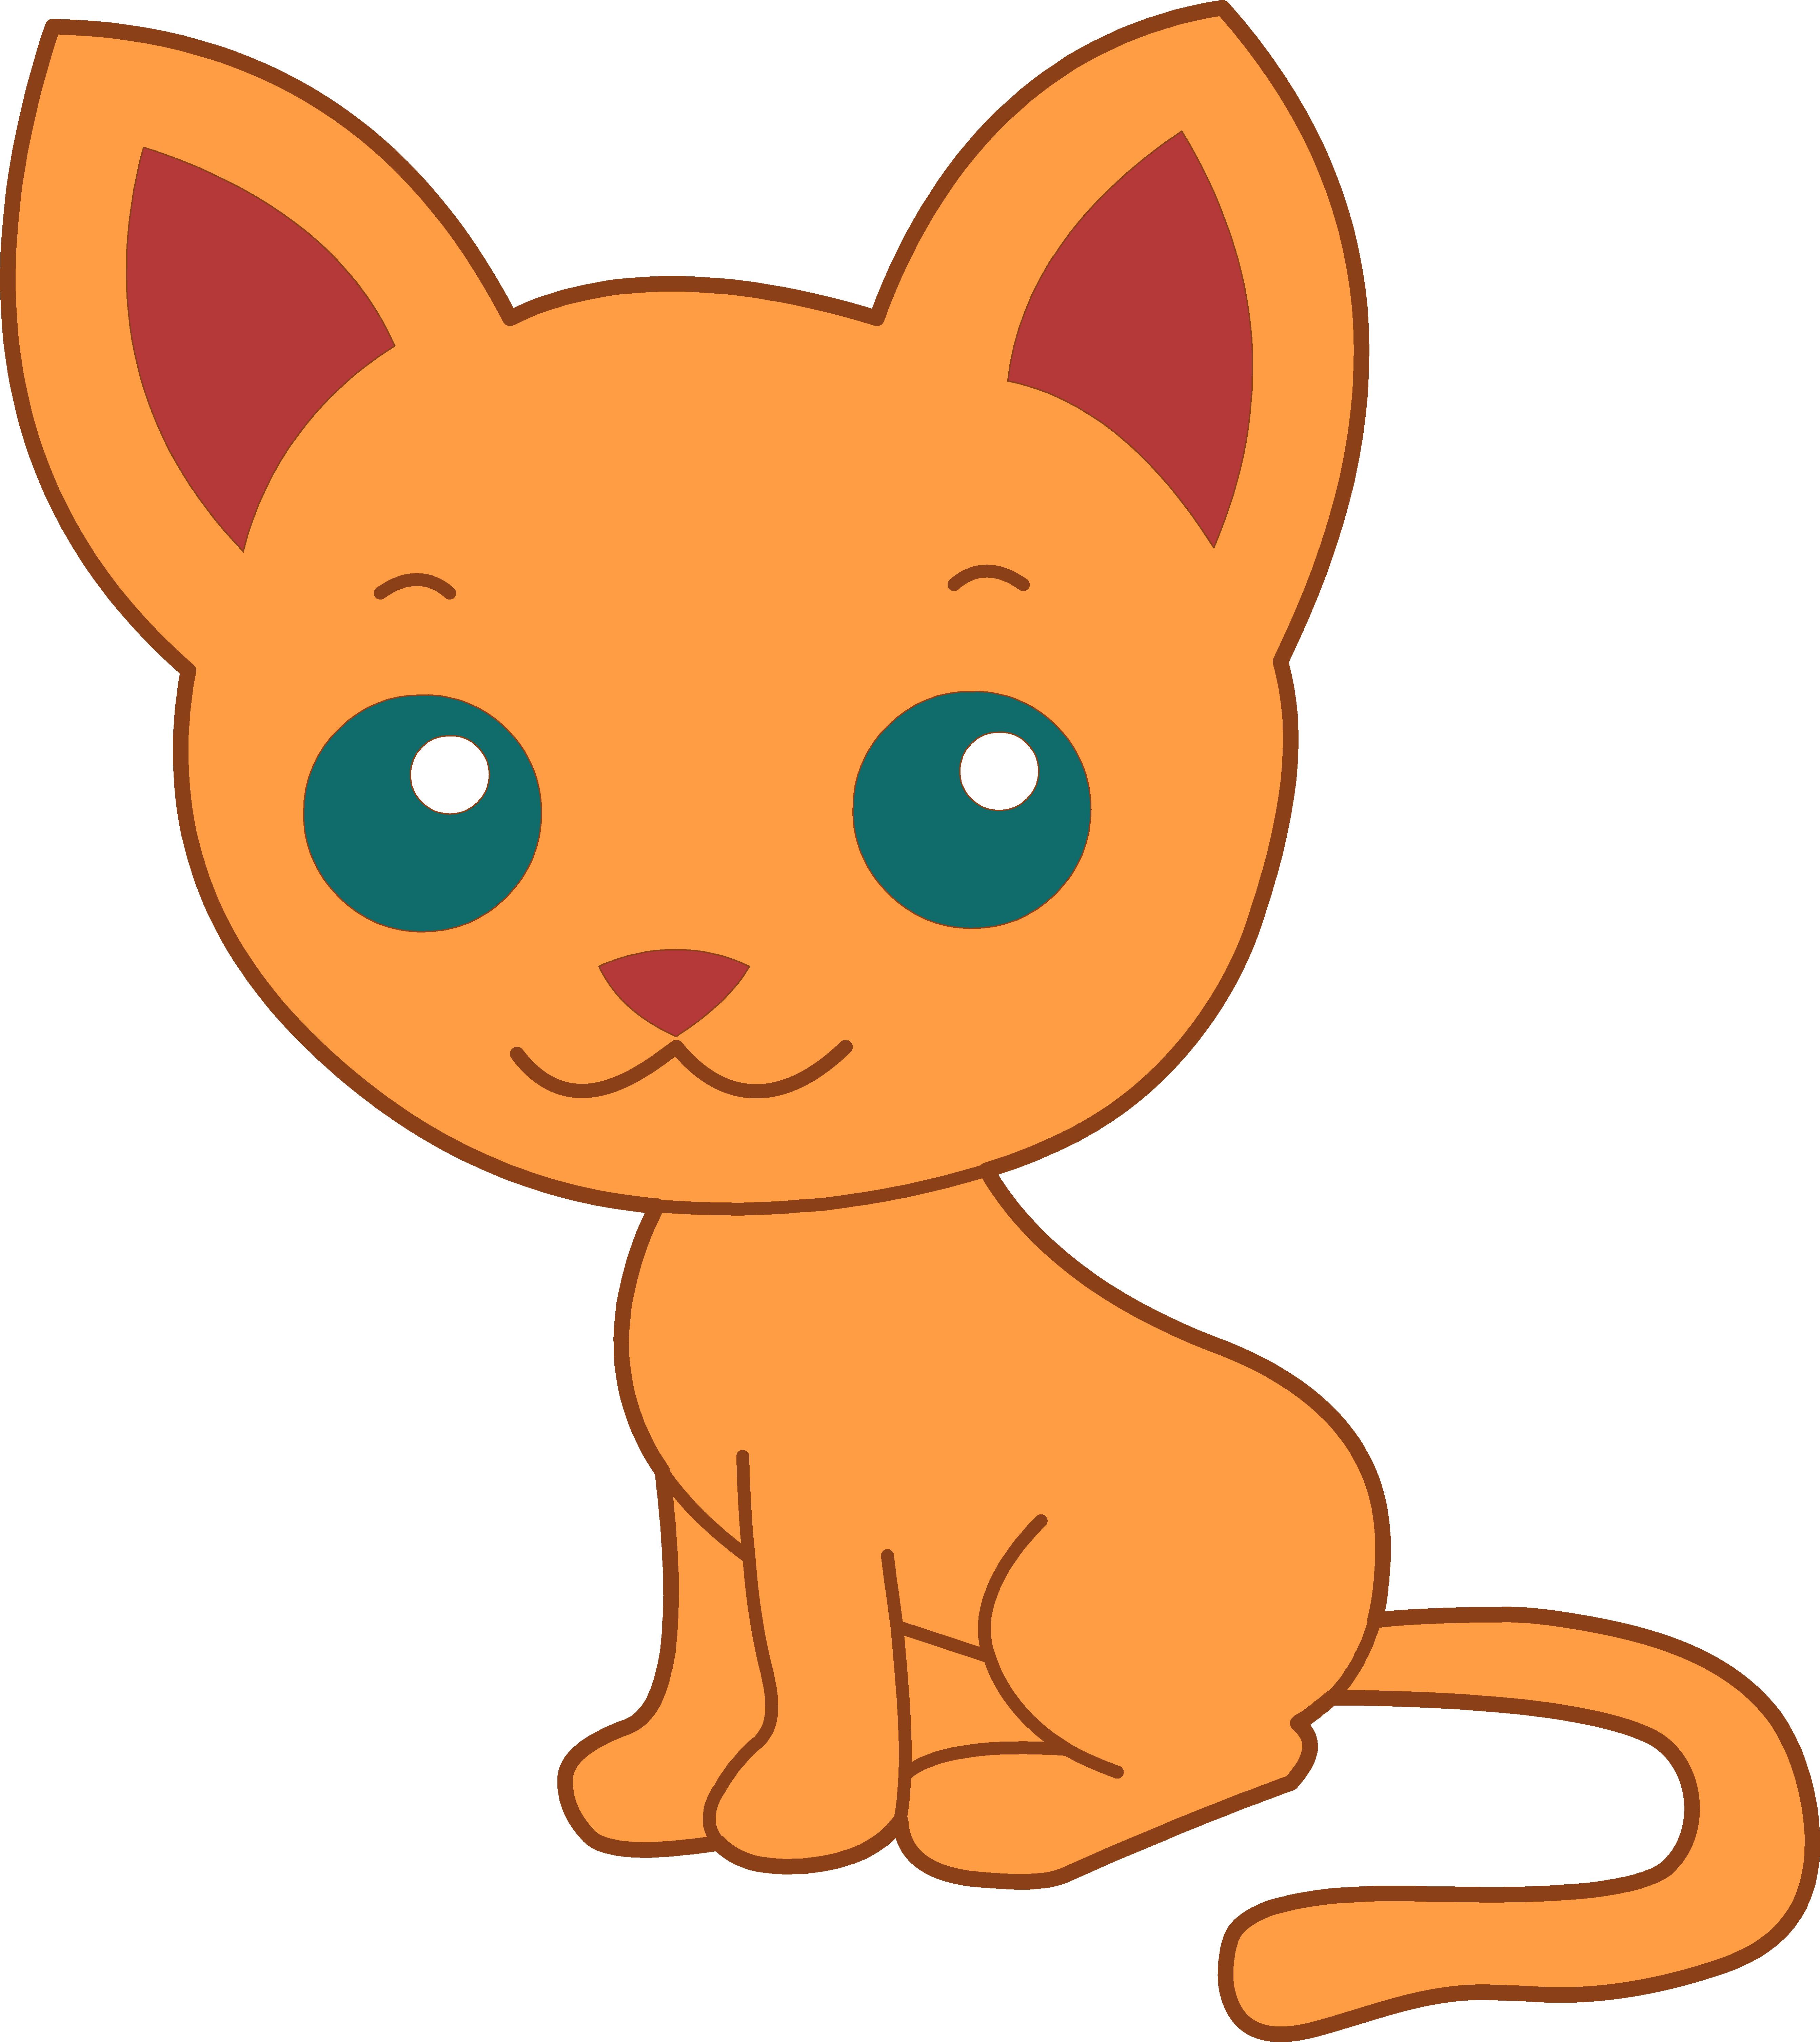 Cute kitty cat free. Kittens clipart orange kitten